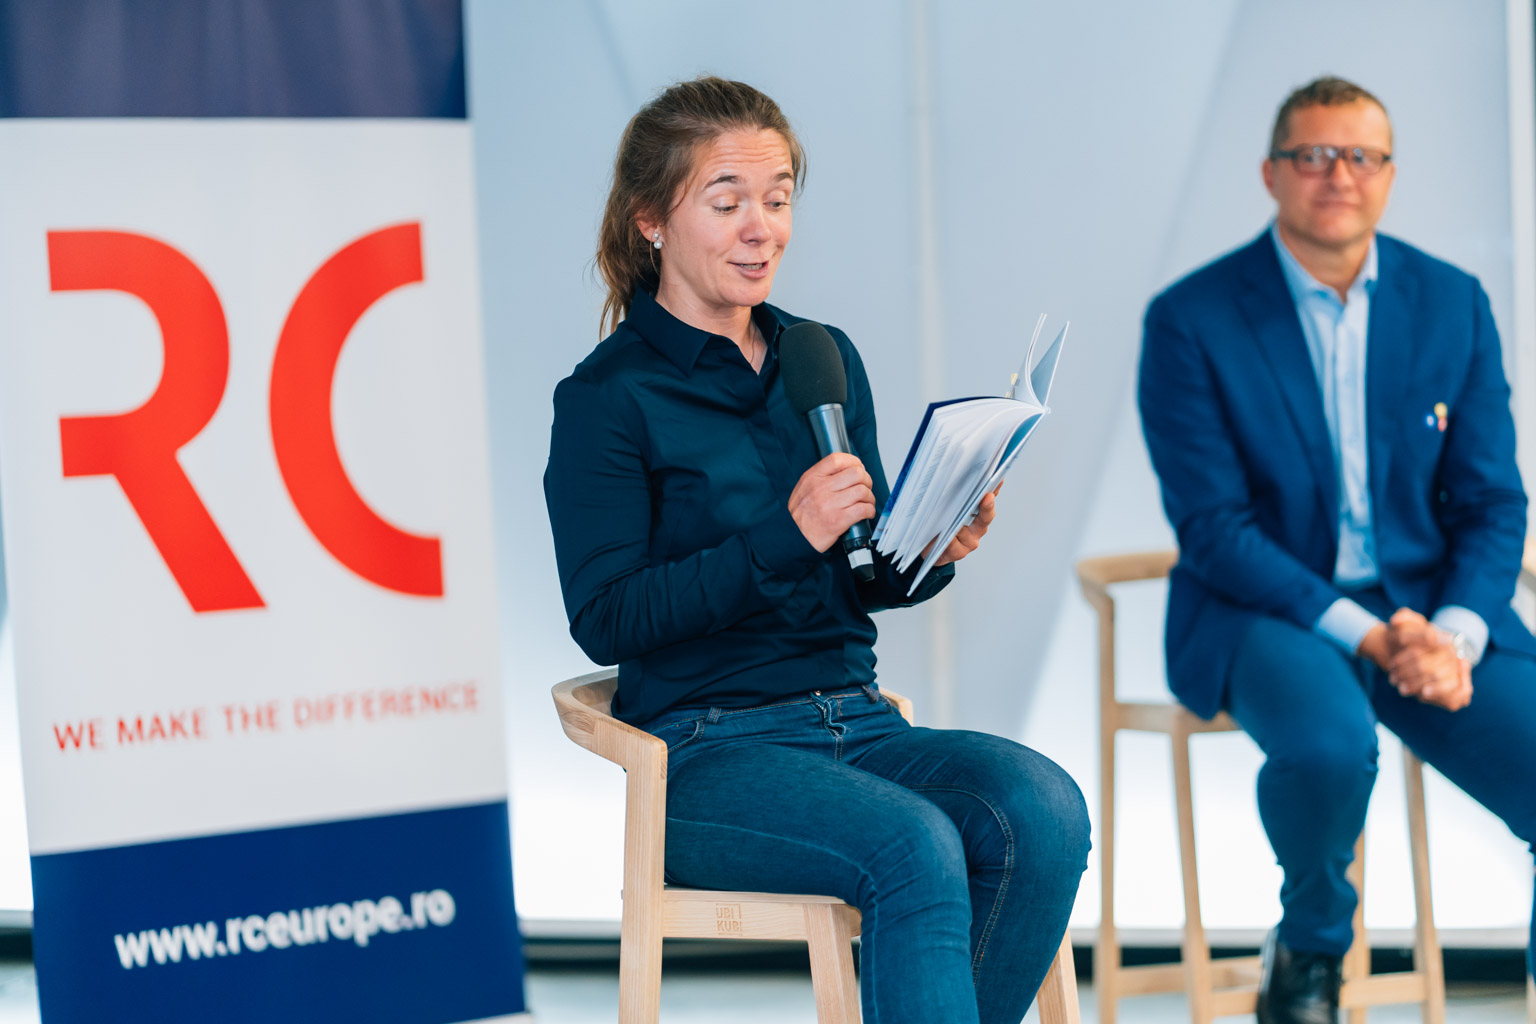 Lansare Carte – RC Europe – Kateřina Mandulová